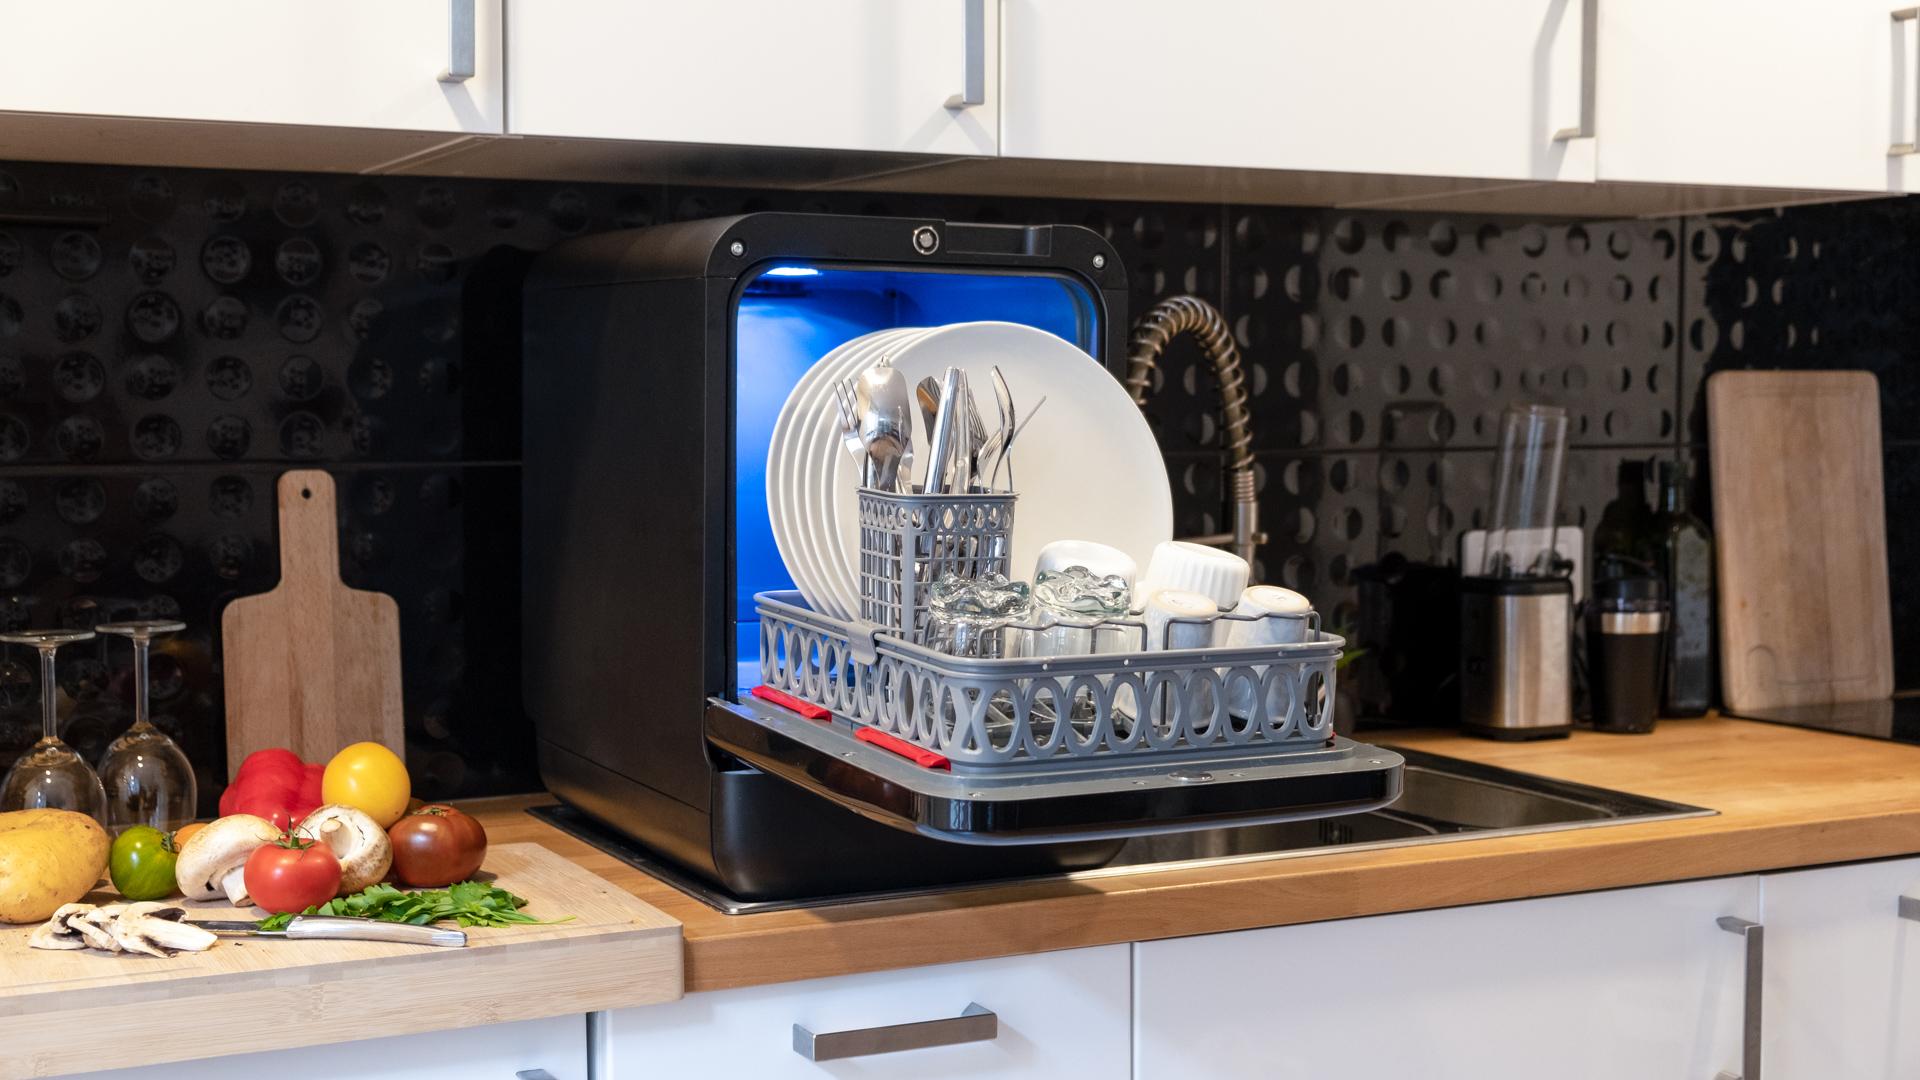 Bob mini dishwasher - Daan Tech